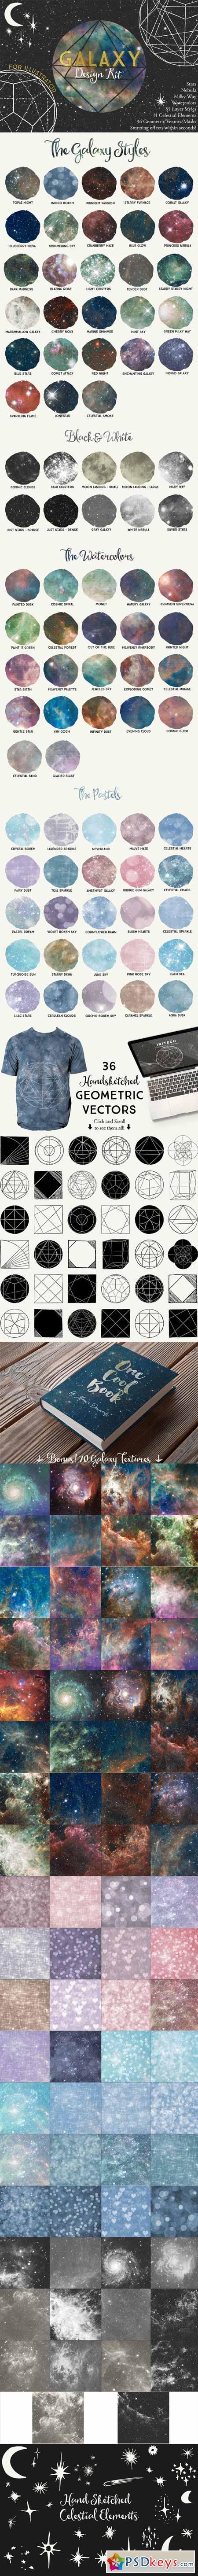 Galaxy Design Kit for Illustrator 335883